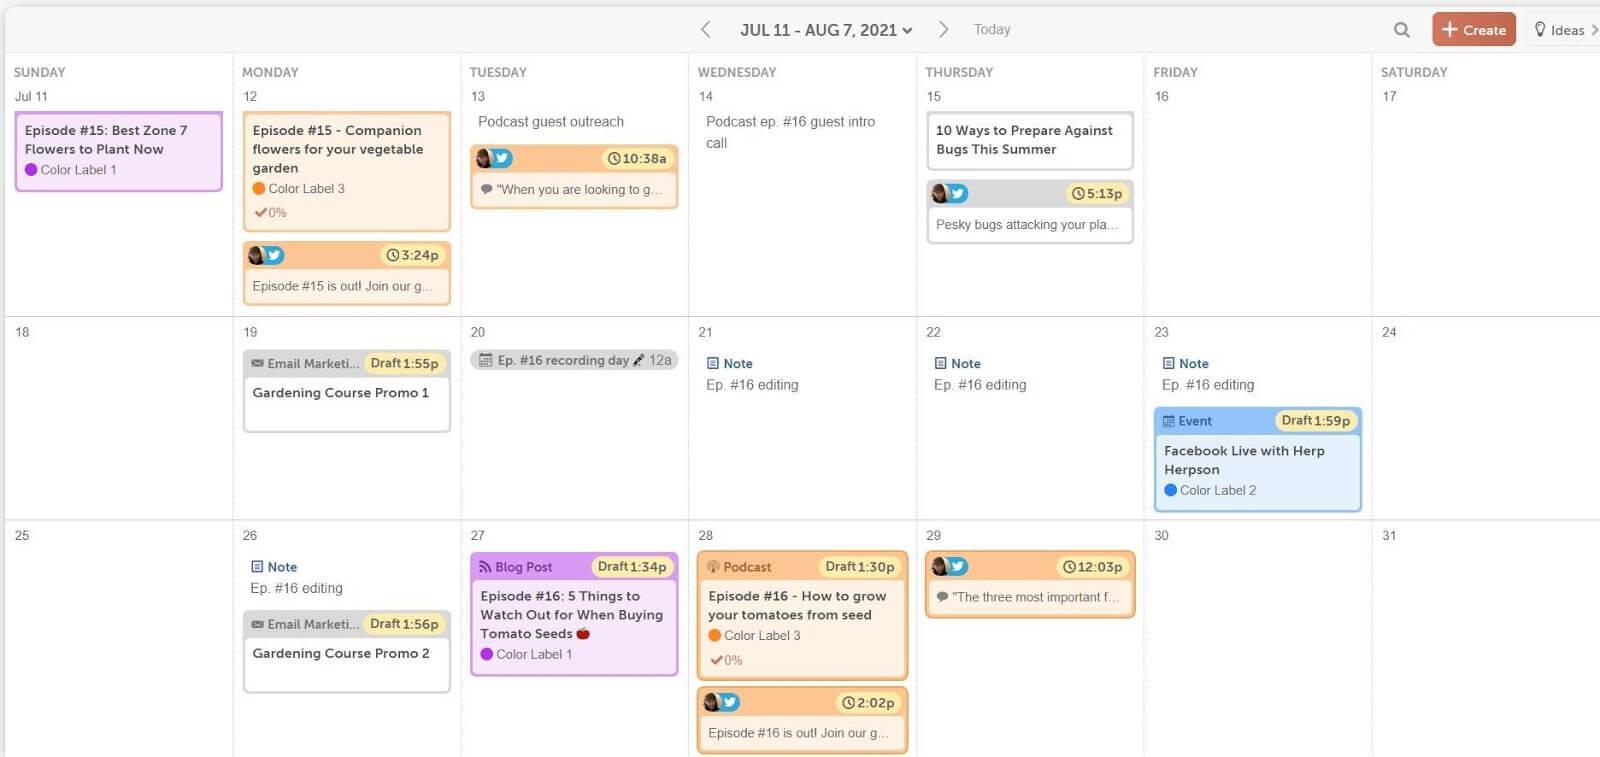 CoSchedule marketing calendar planning